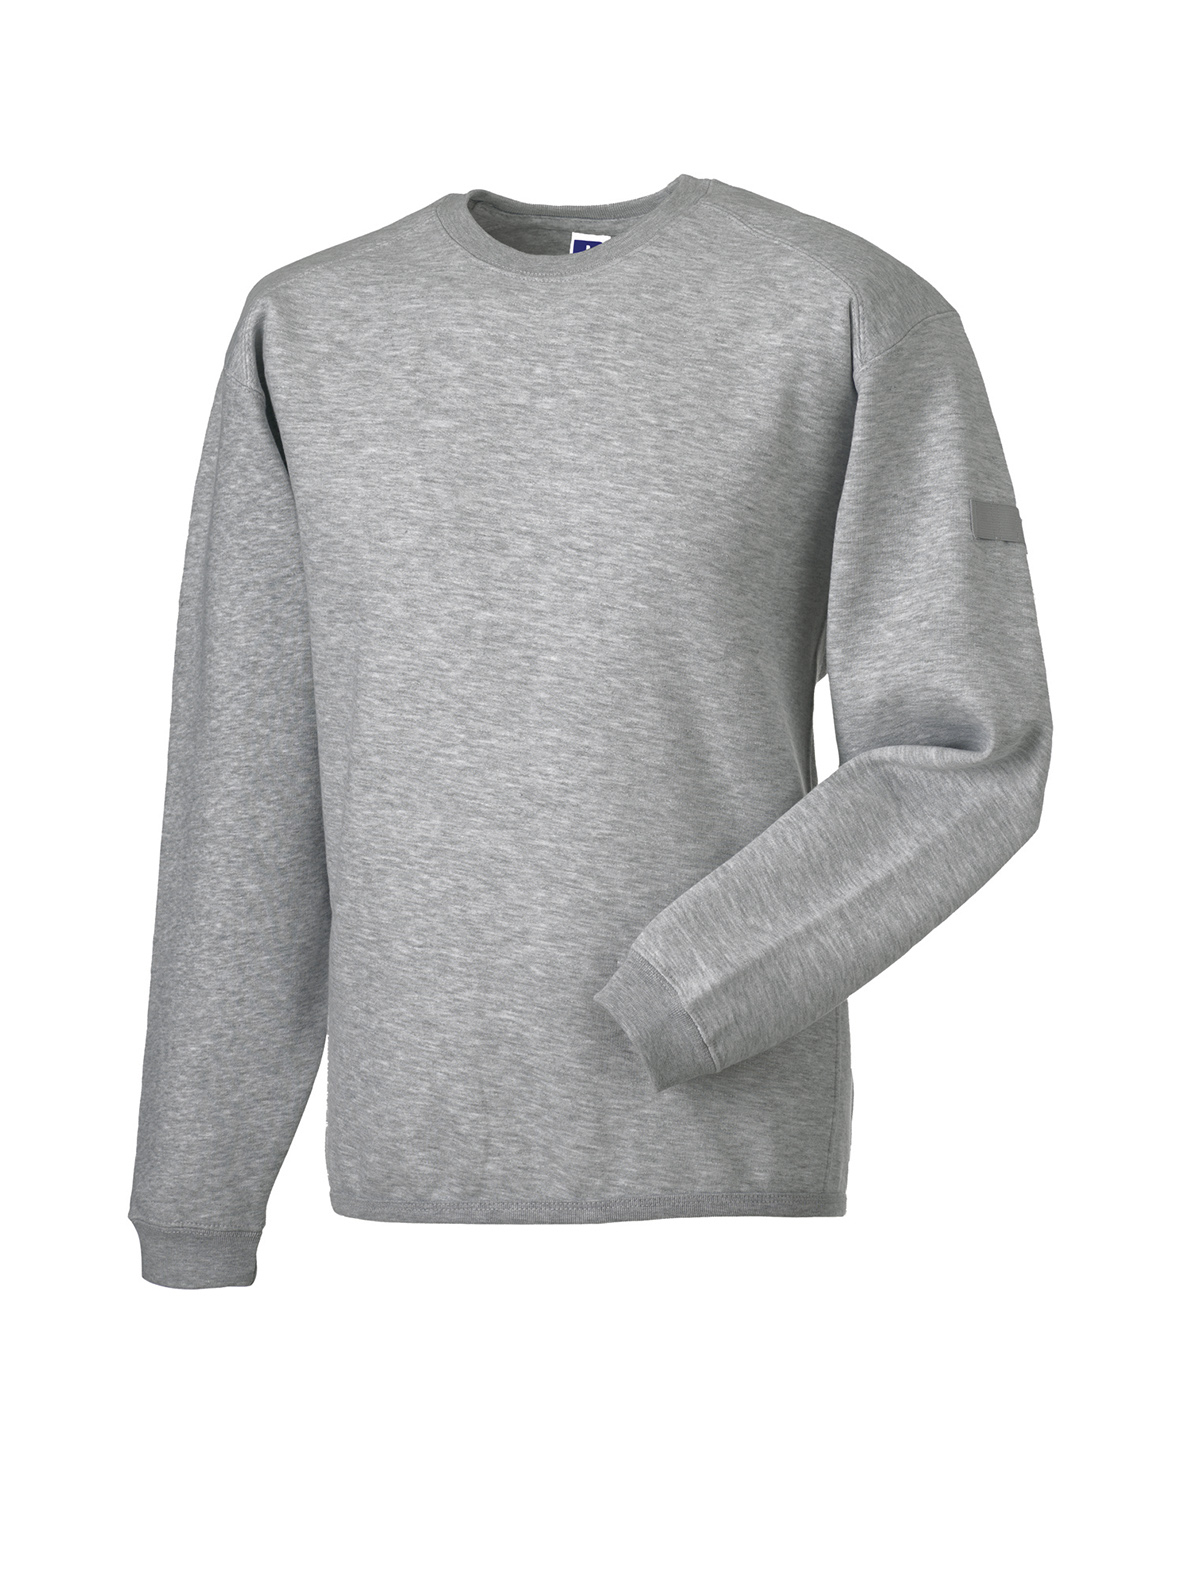 Sweatshirt Workwear